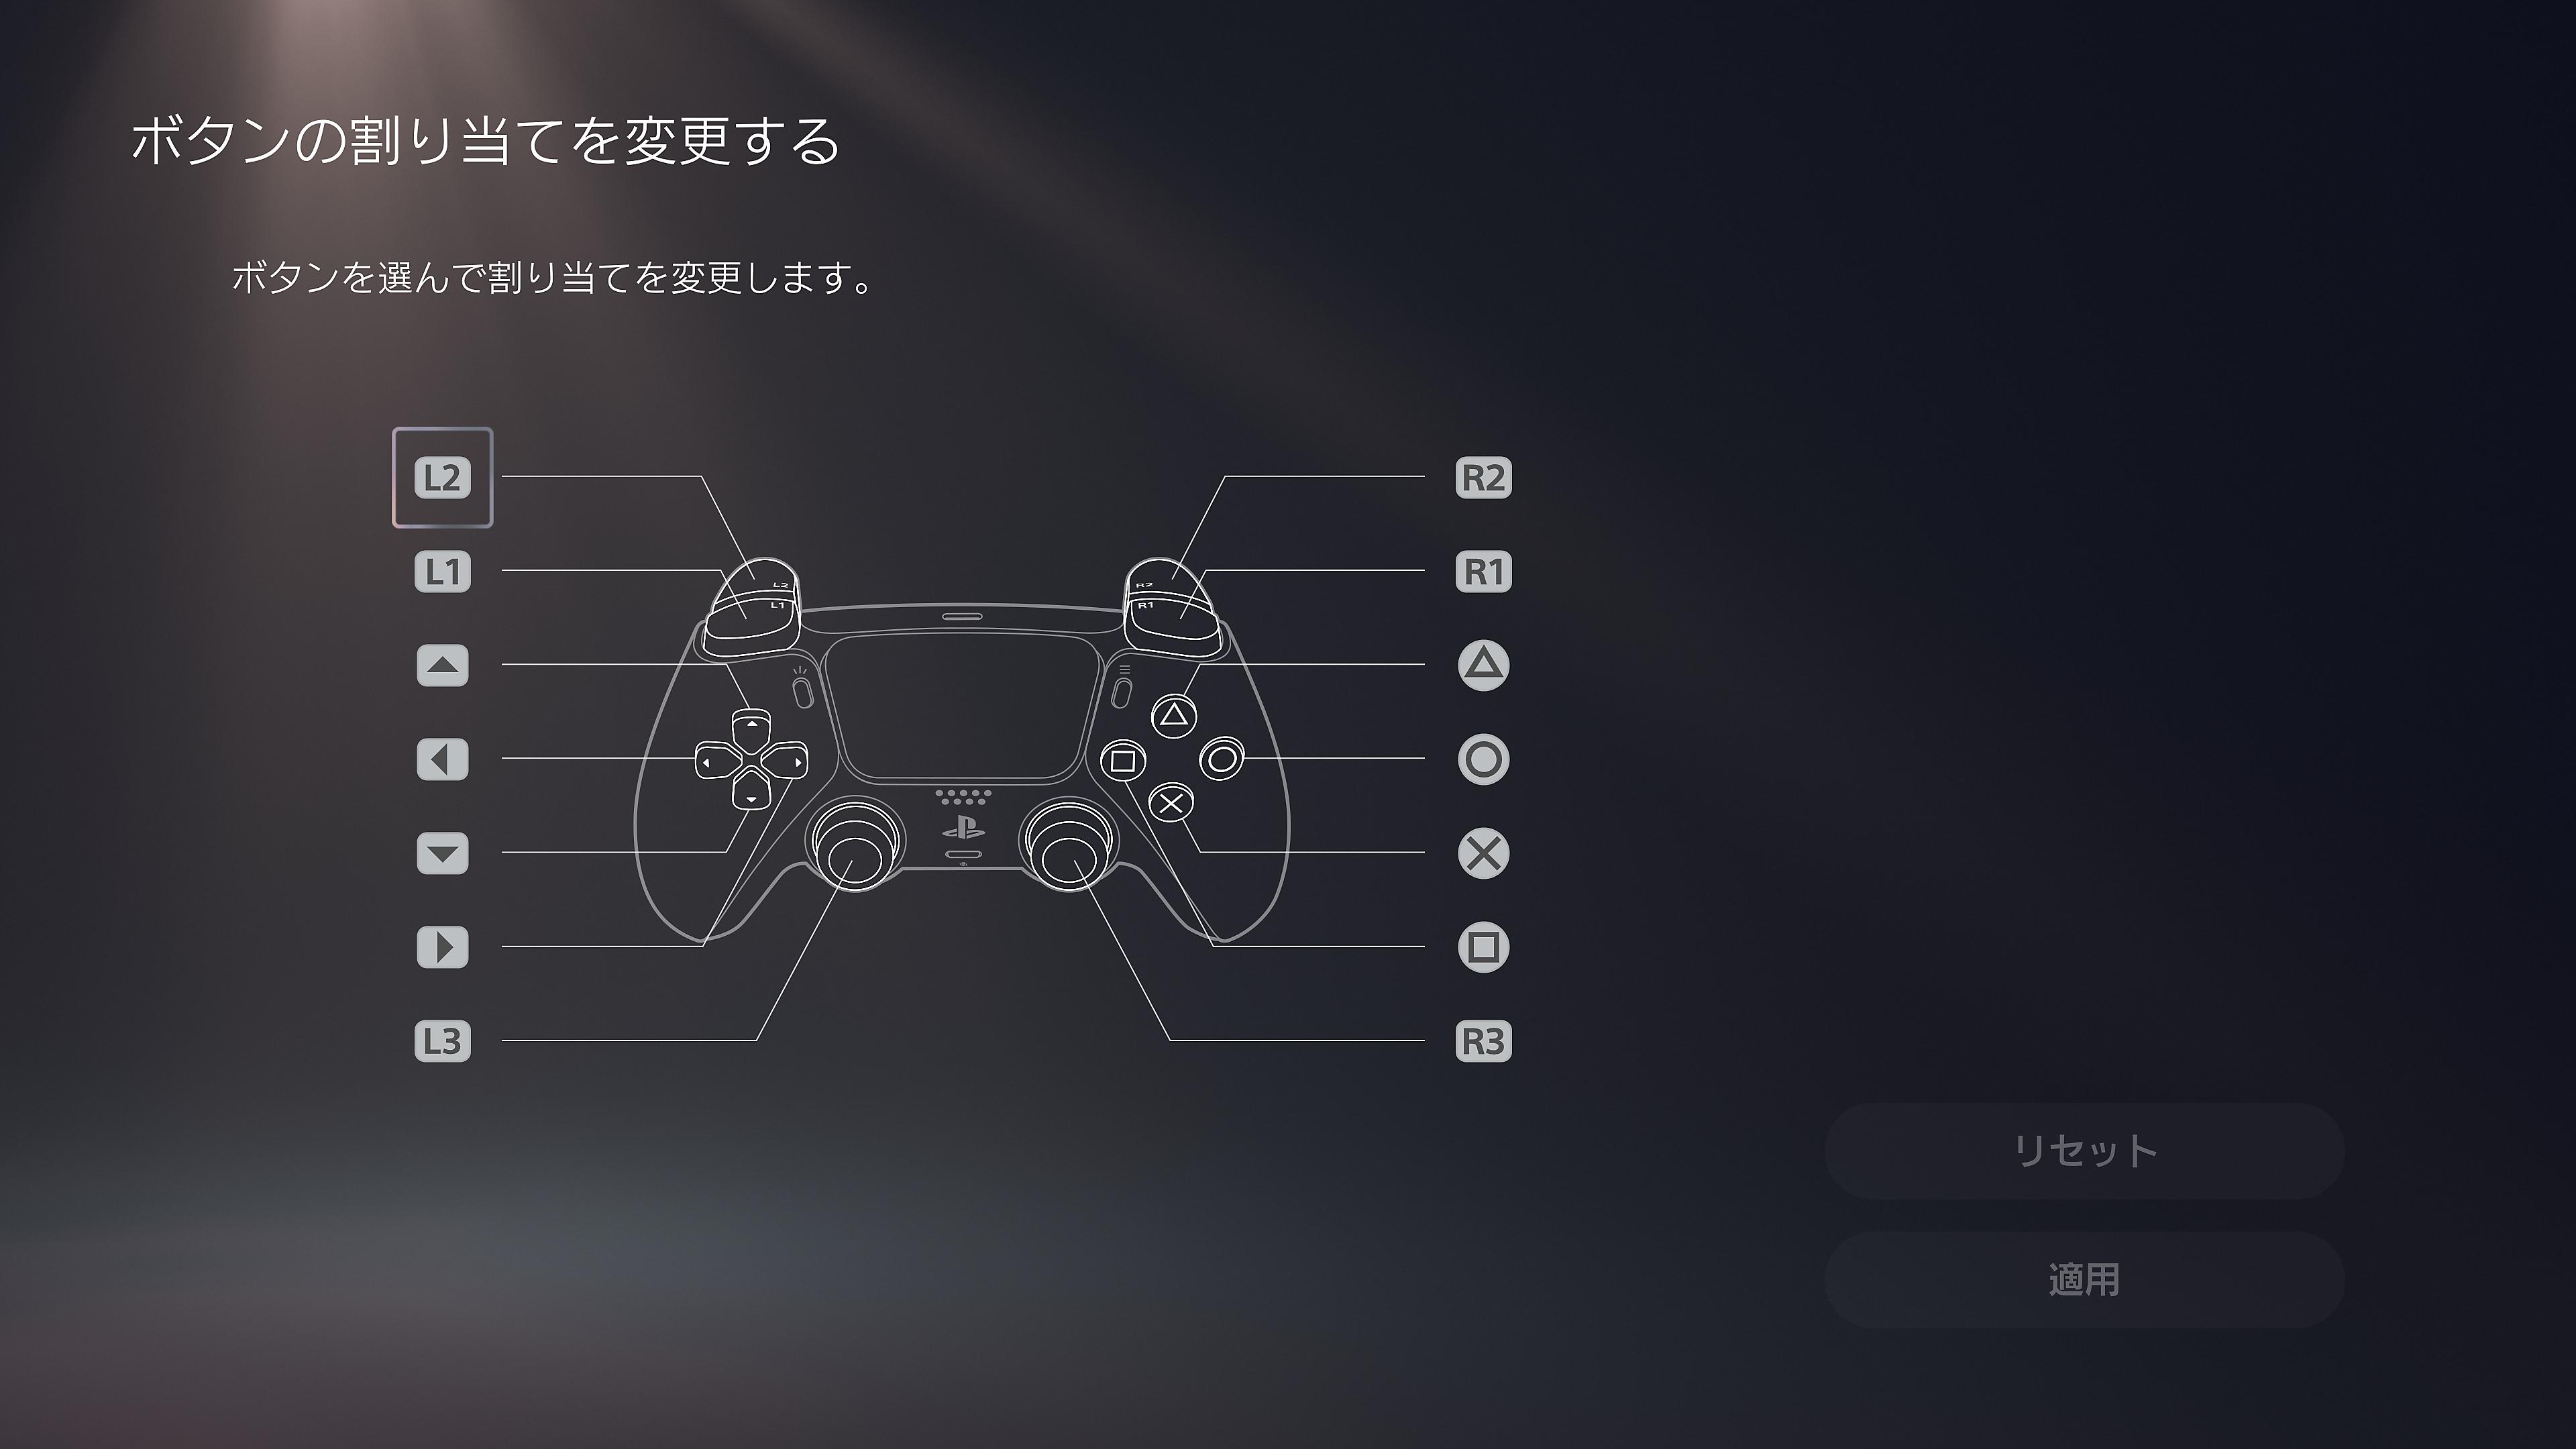 PS5でボタンの割り当てを変更する